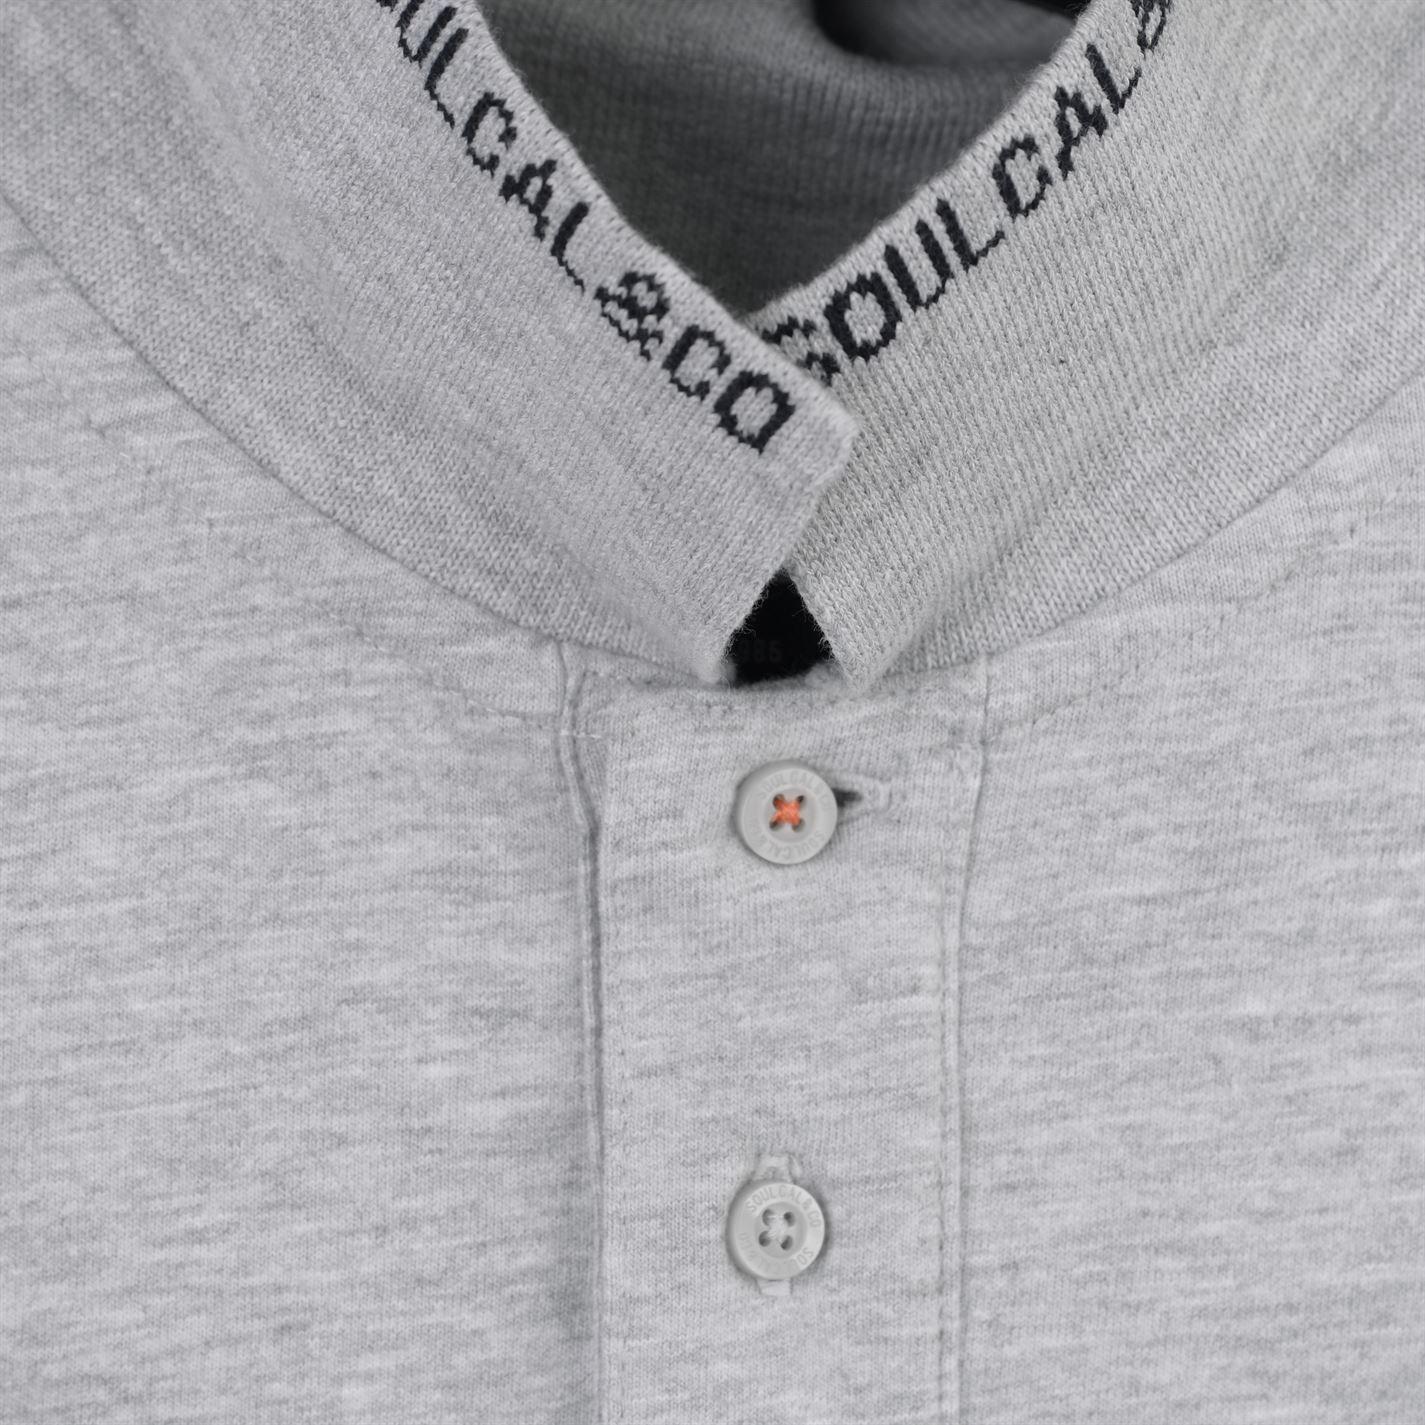 5a91154e4b6 Polo majica SoulCal Signature Polo Shirt Mens Siva - Jeftinije.hr